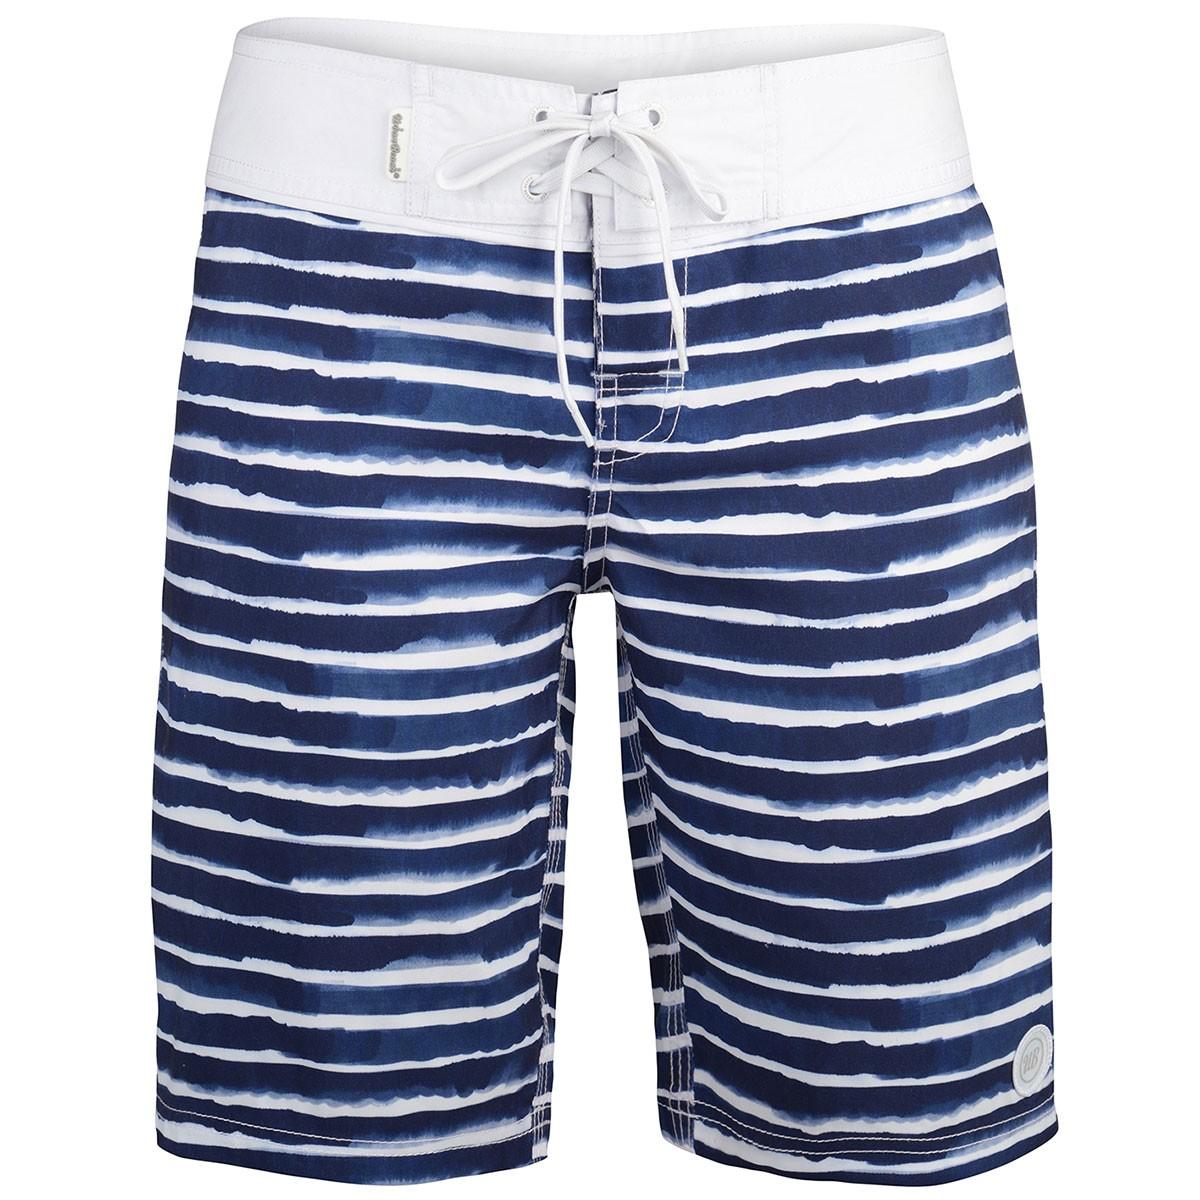 Womens Kapalua Board Shorts - Navy - Boardshorts - Clothing - Womens 6bc0f92a2